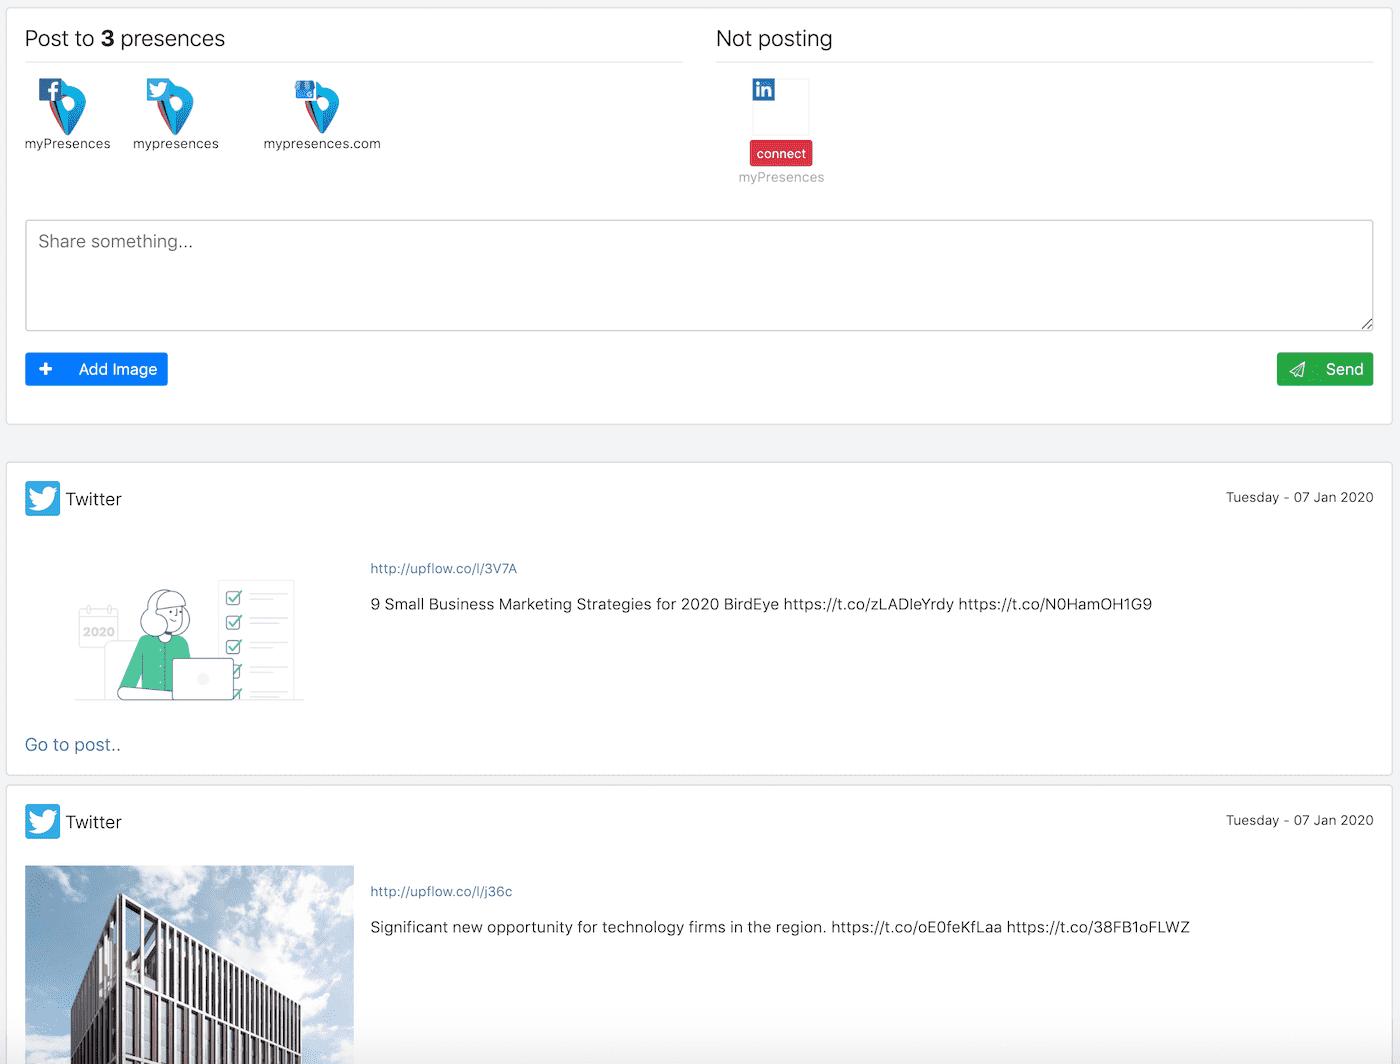 myPresences social page screenshot